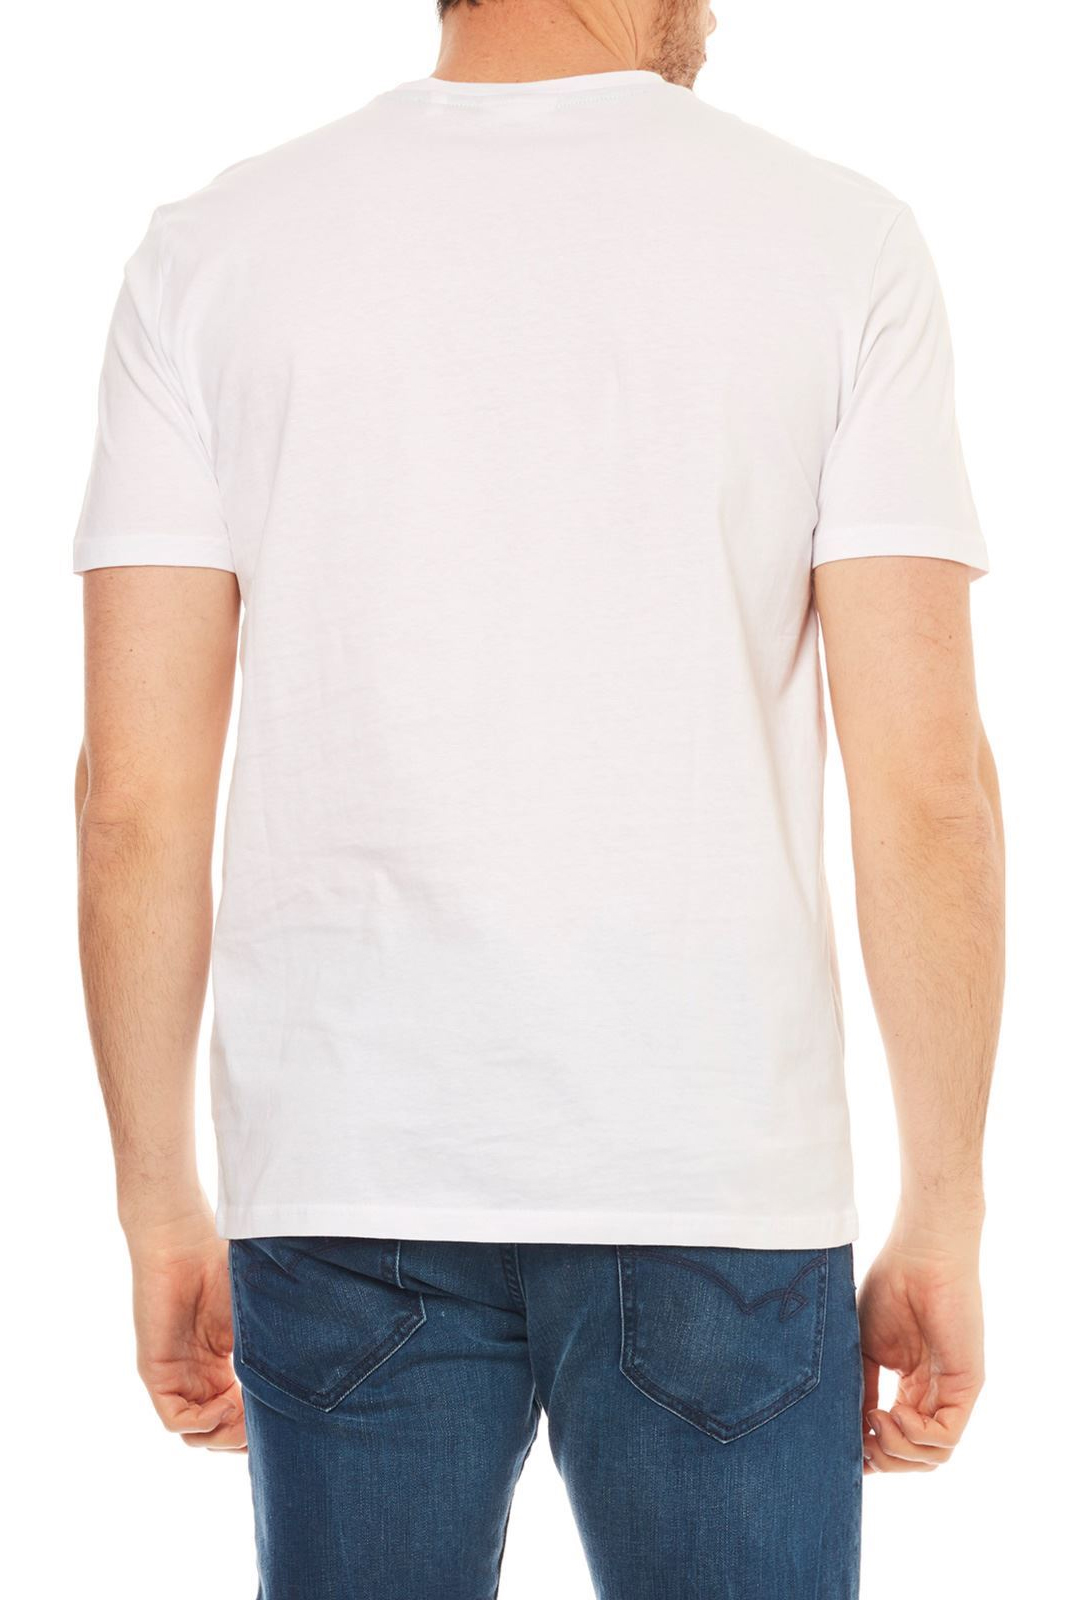 Tee-shirts  Kaporal PARC WHITE